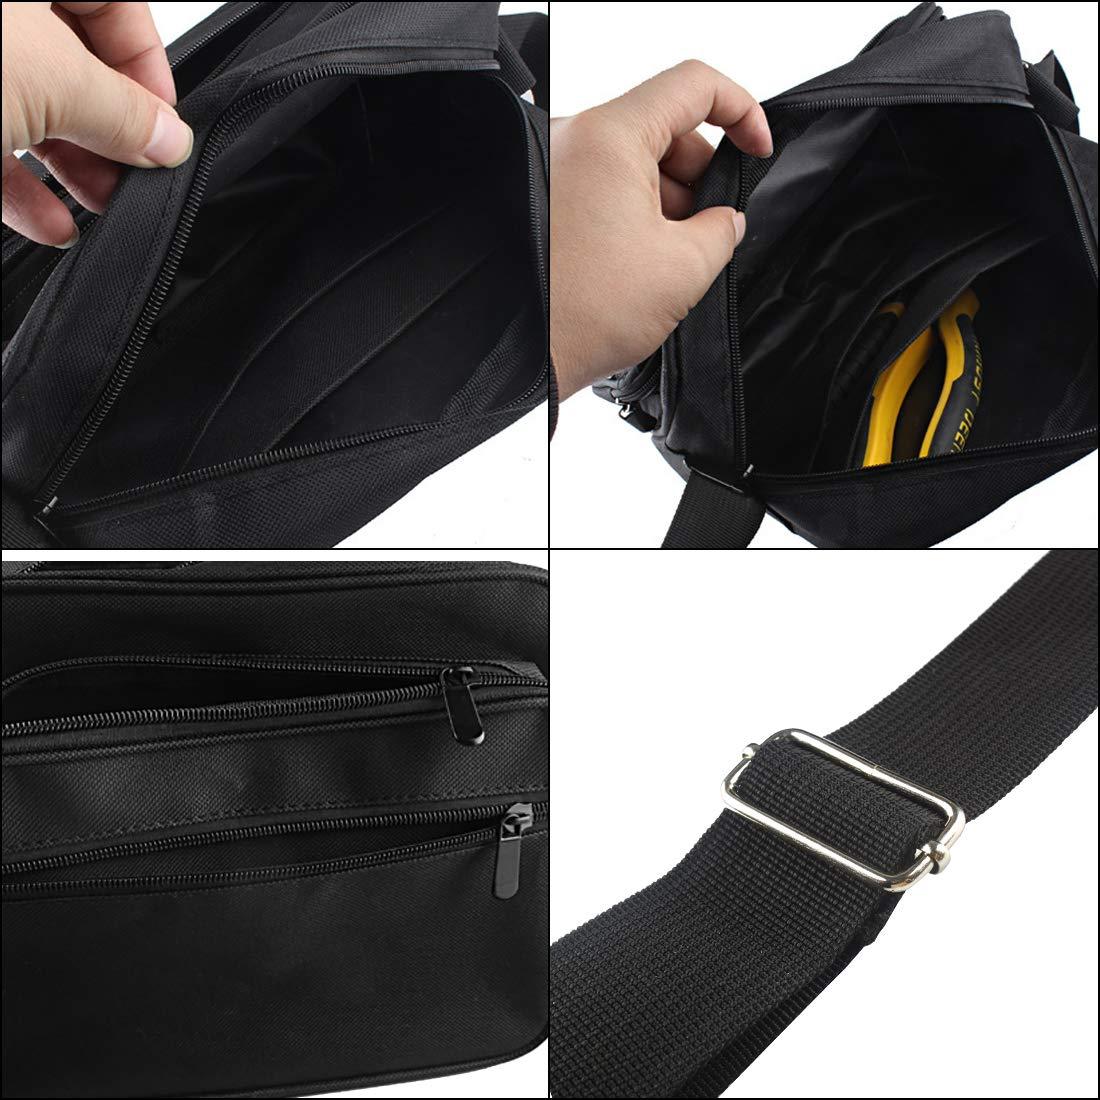 Andux Zone Bolsa de herramientas de lona Bolsa de hombro Kit de hardware Bolsos de colecci/ón gruesos Bolso electricista negro WJSNB-03